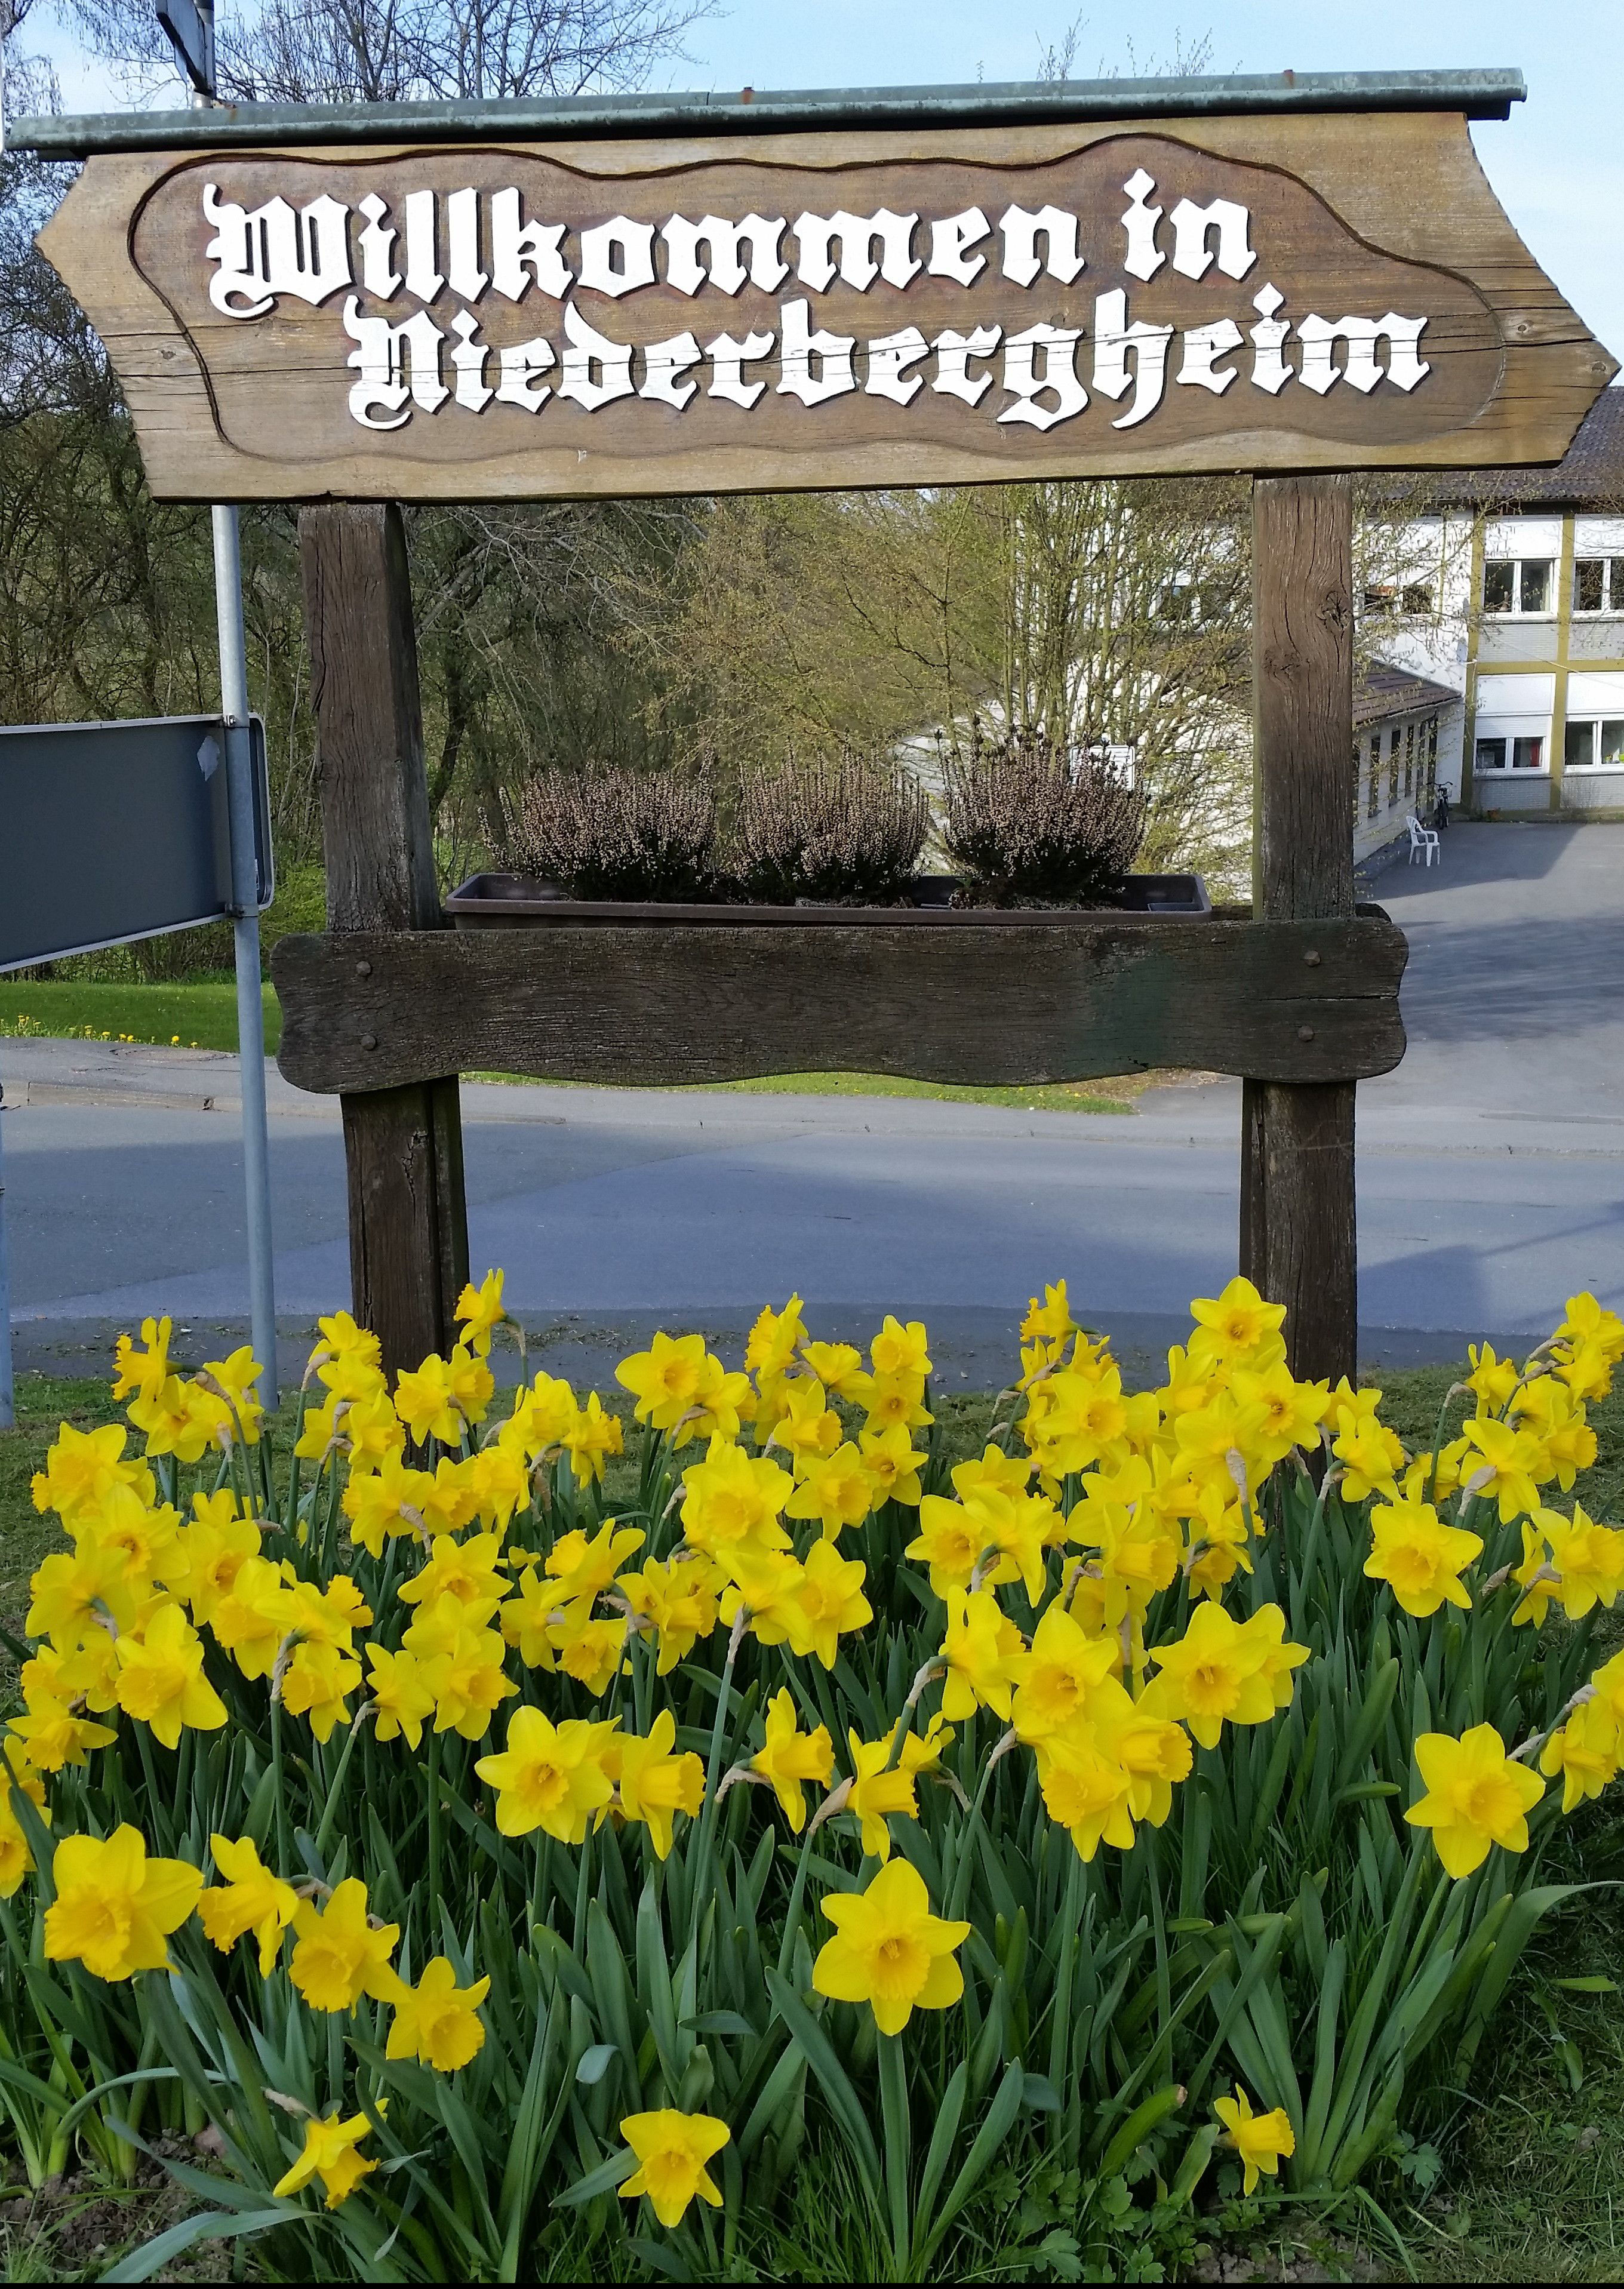 Begrüßungsschild aus Richtung Hirschberg kommend